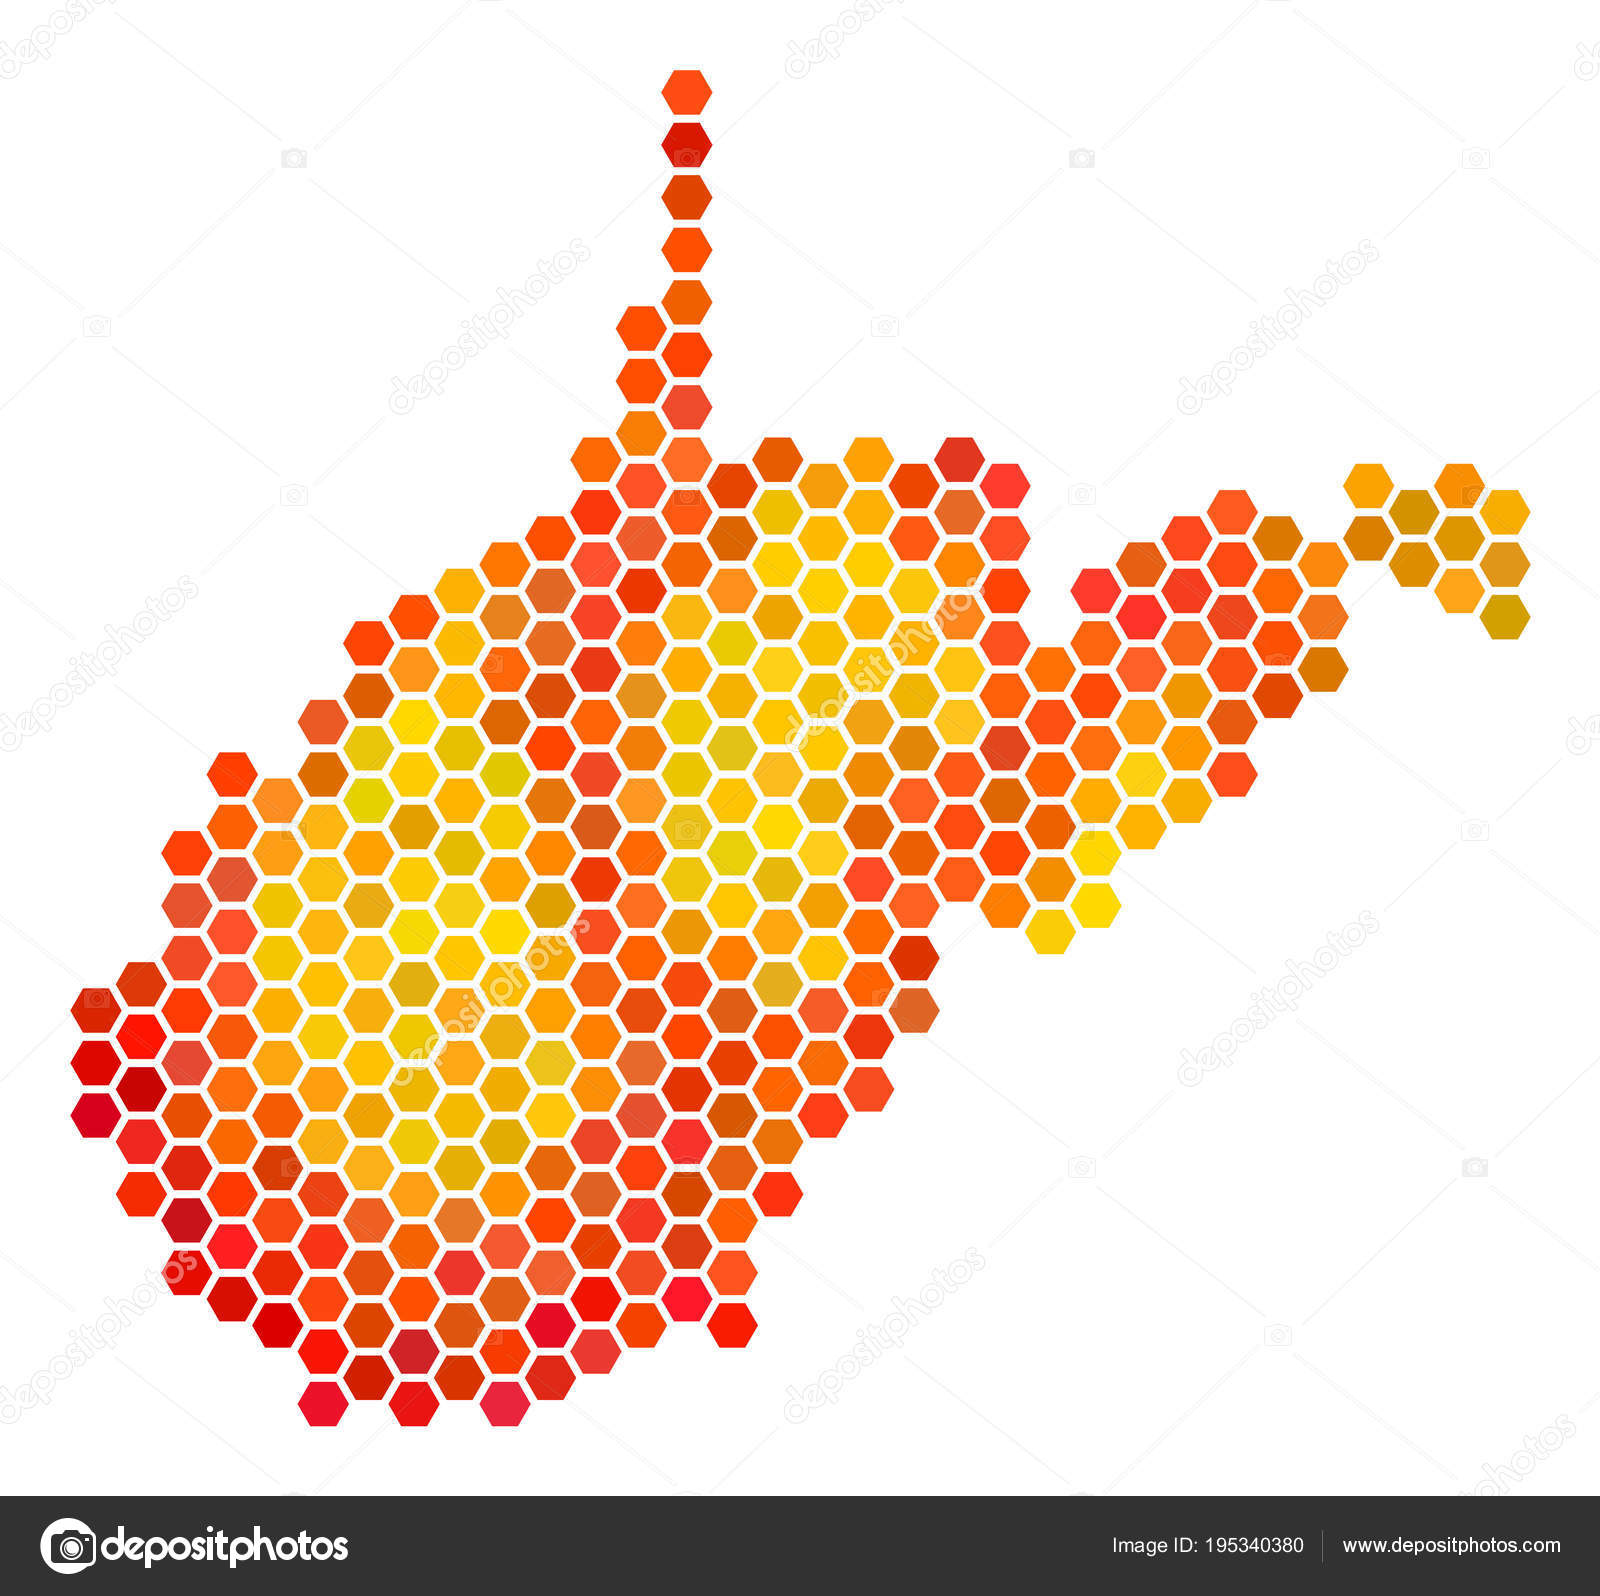 Orange Hexagon West Virginia State Map Stock Vector C Ahasoft